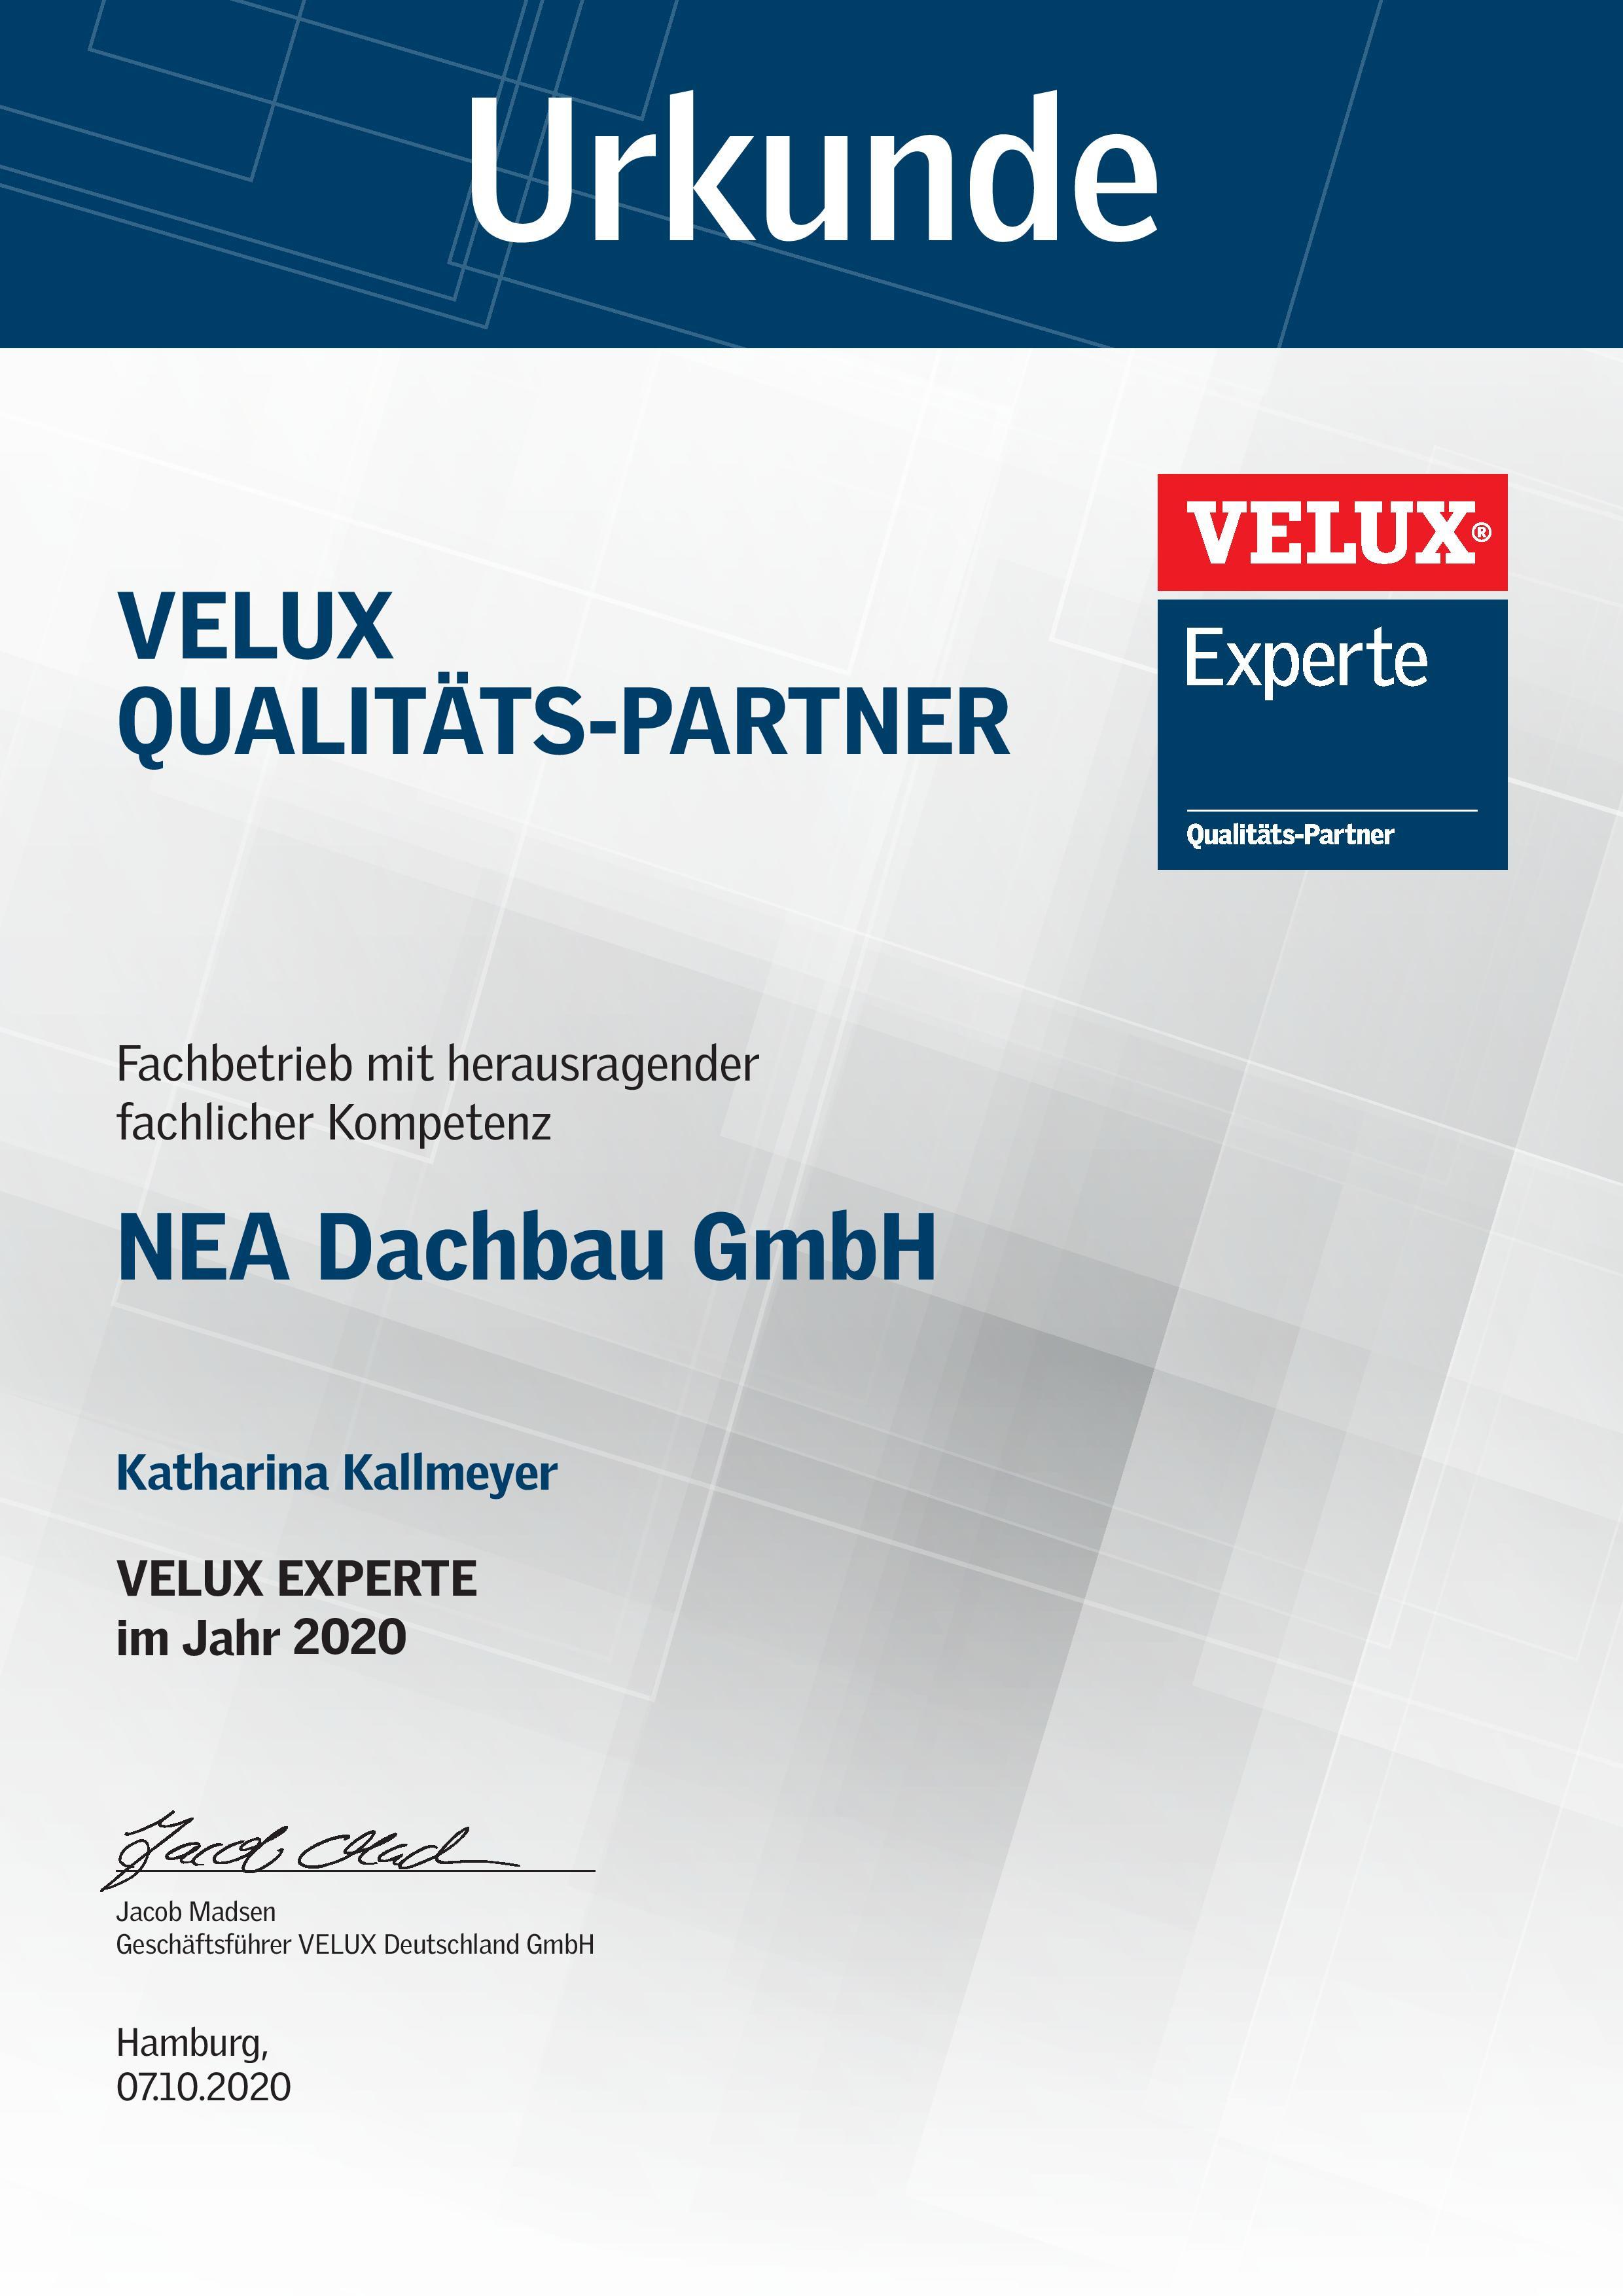 VELUX Experte Urkunde